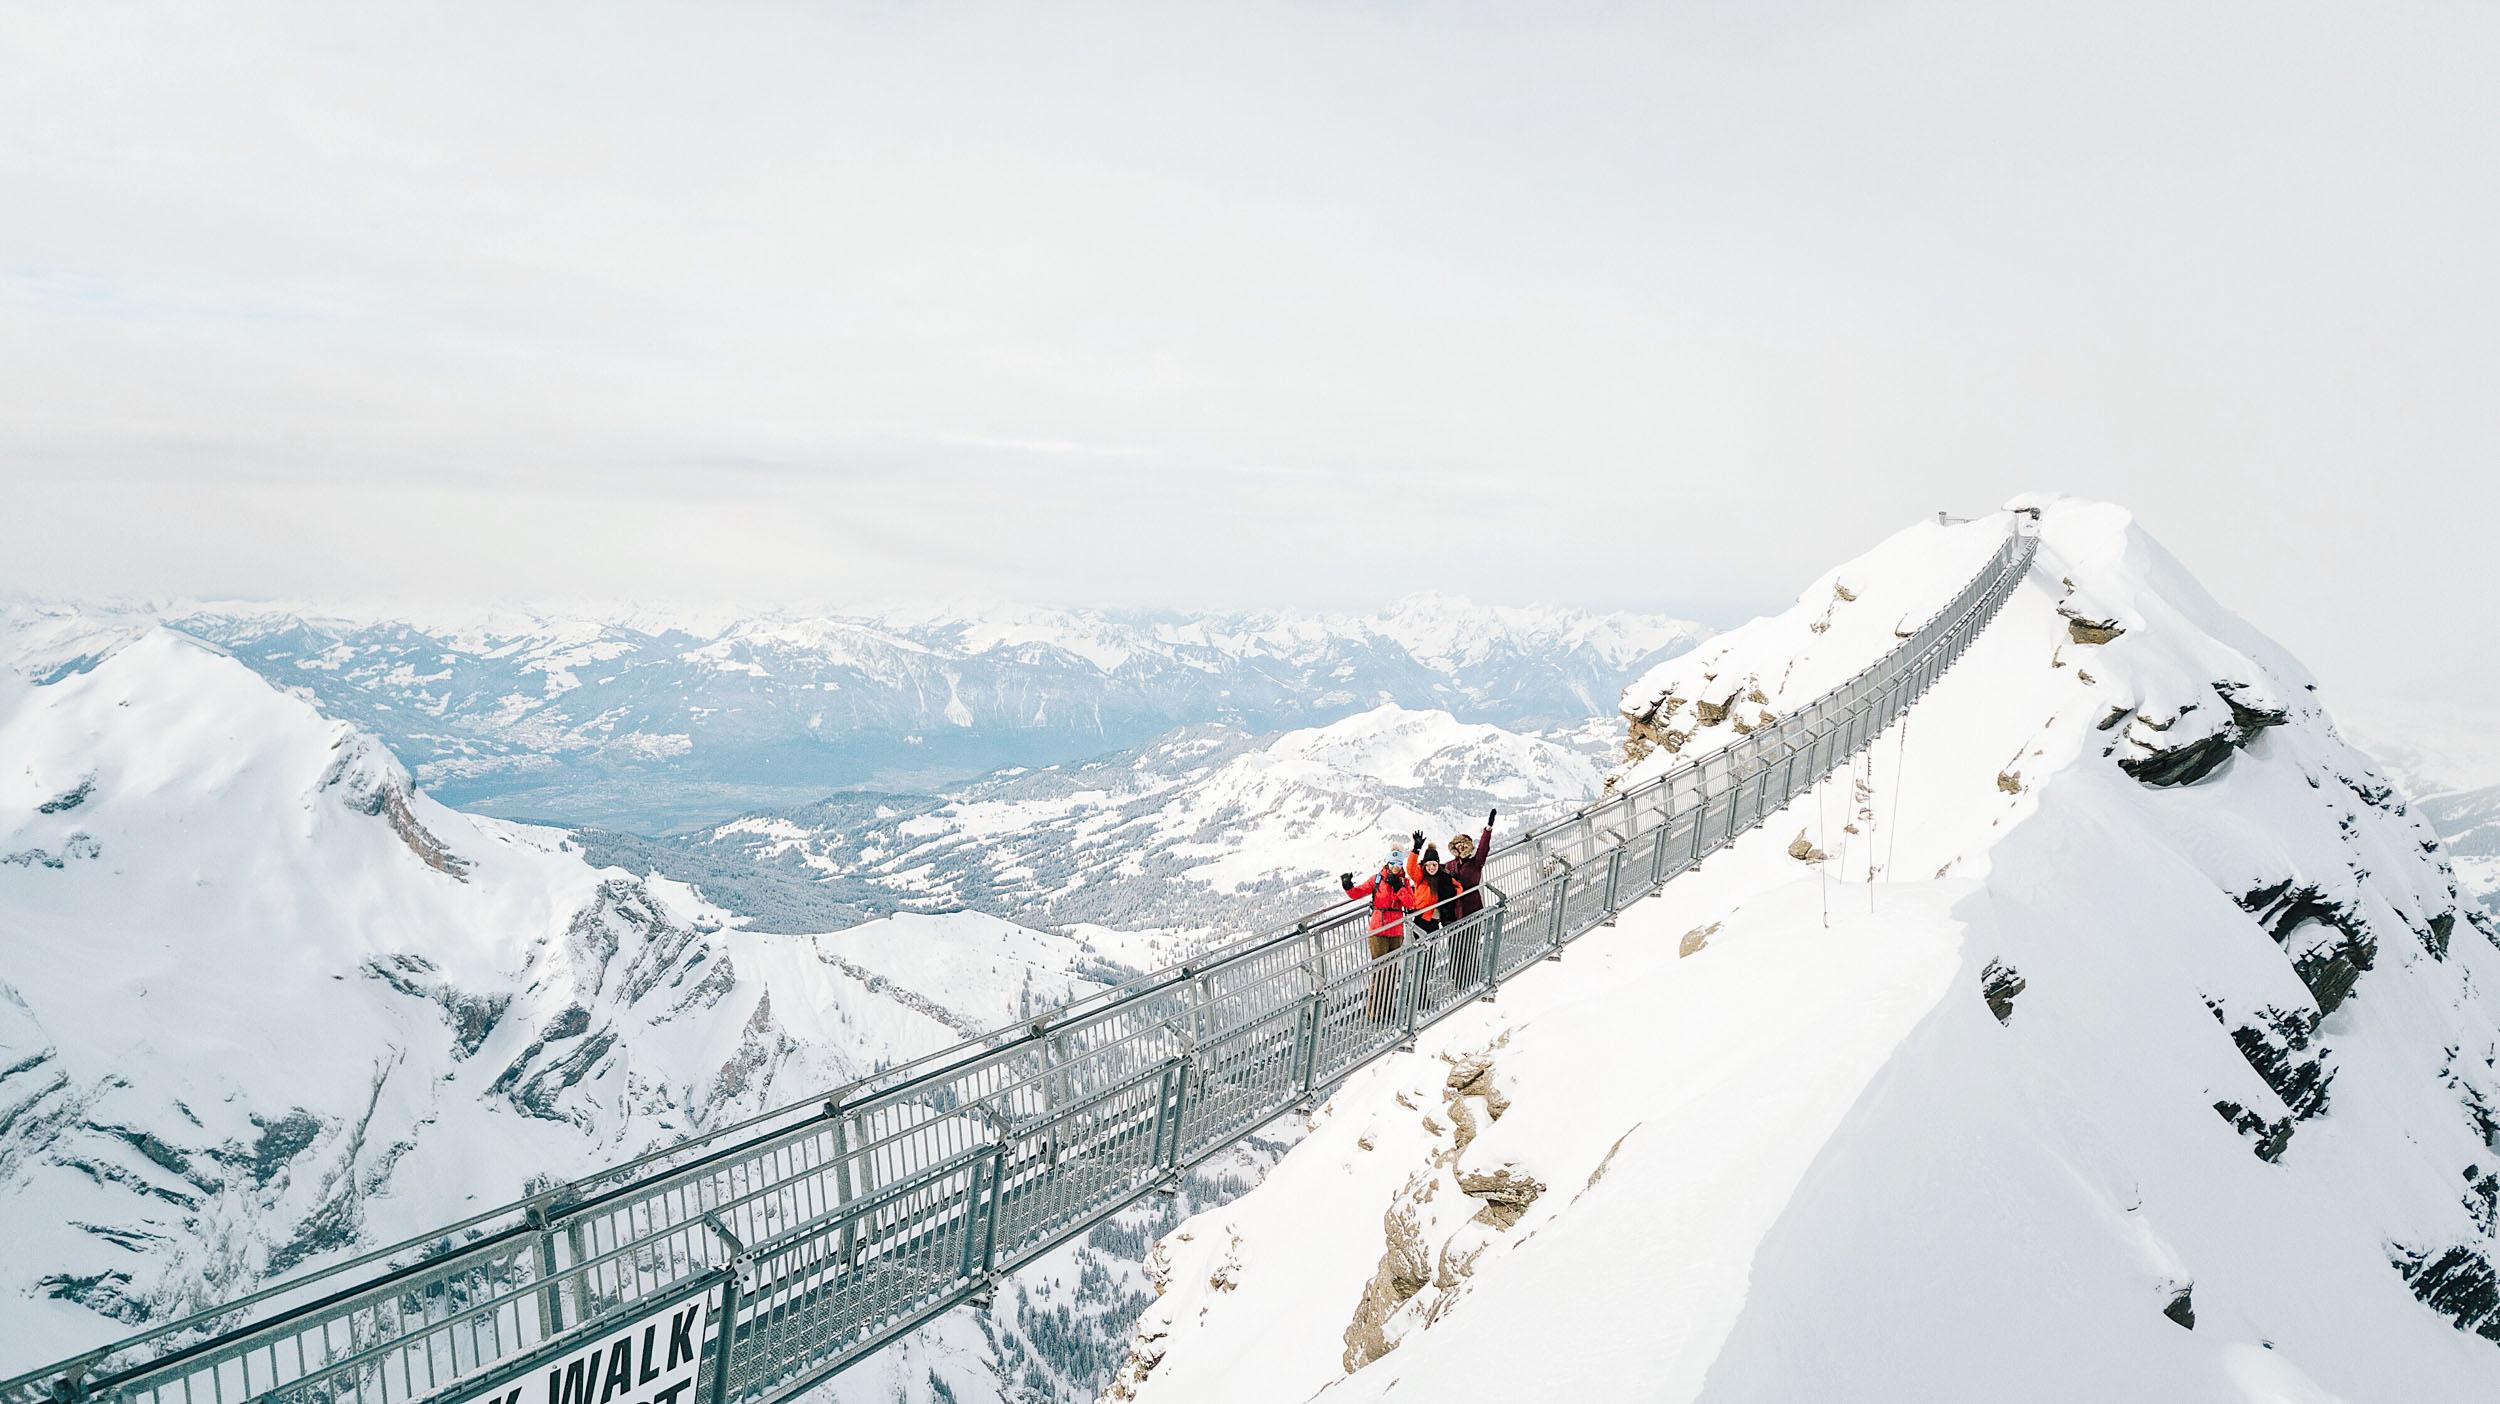 Glacier 3,000 Peak Walk in Gstaad